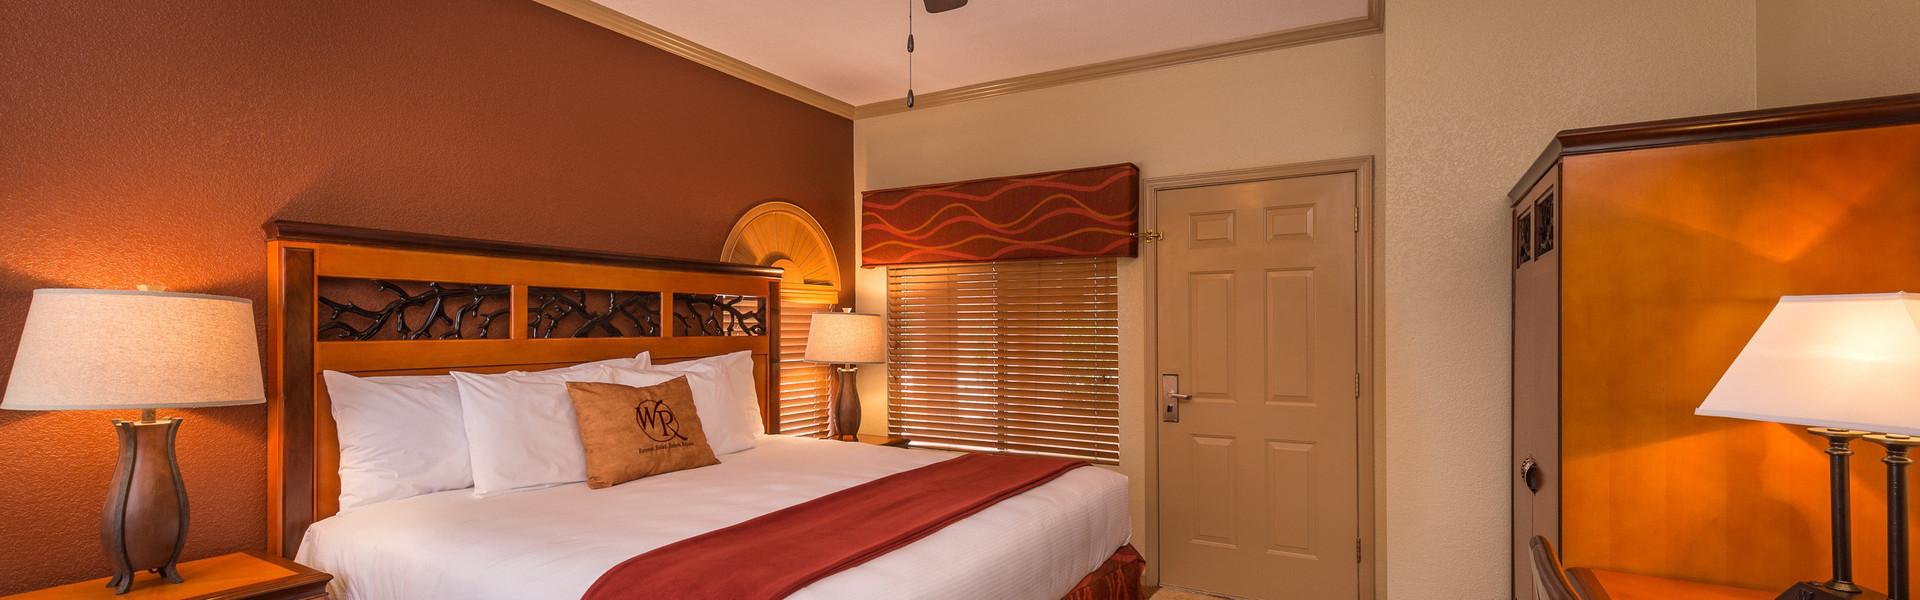 One-Bedroom Villa Hotel Space in Mesa, AZ | Westgate Painted Mountain Golf Resort